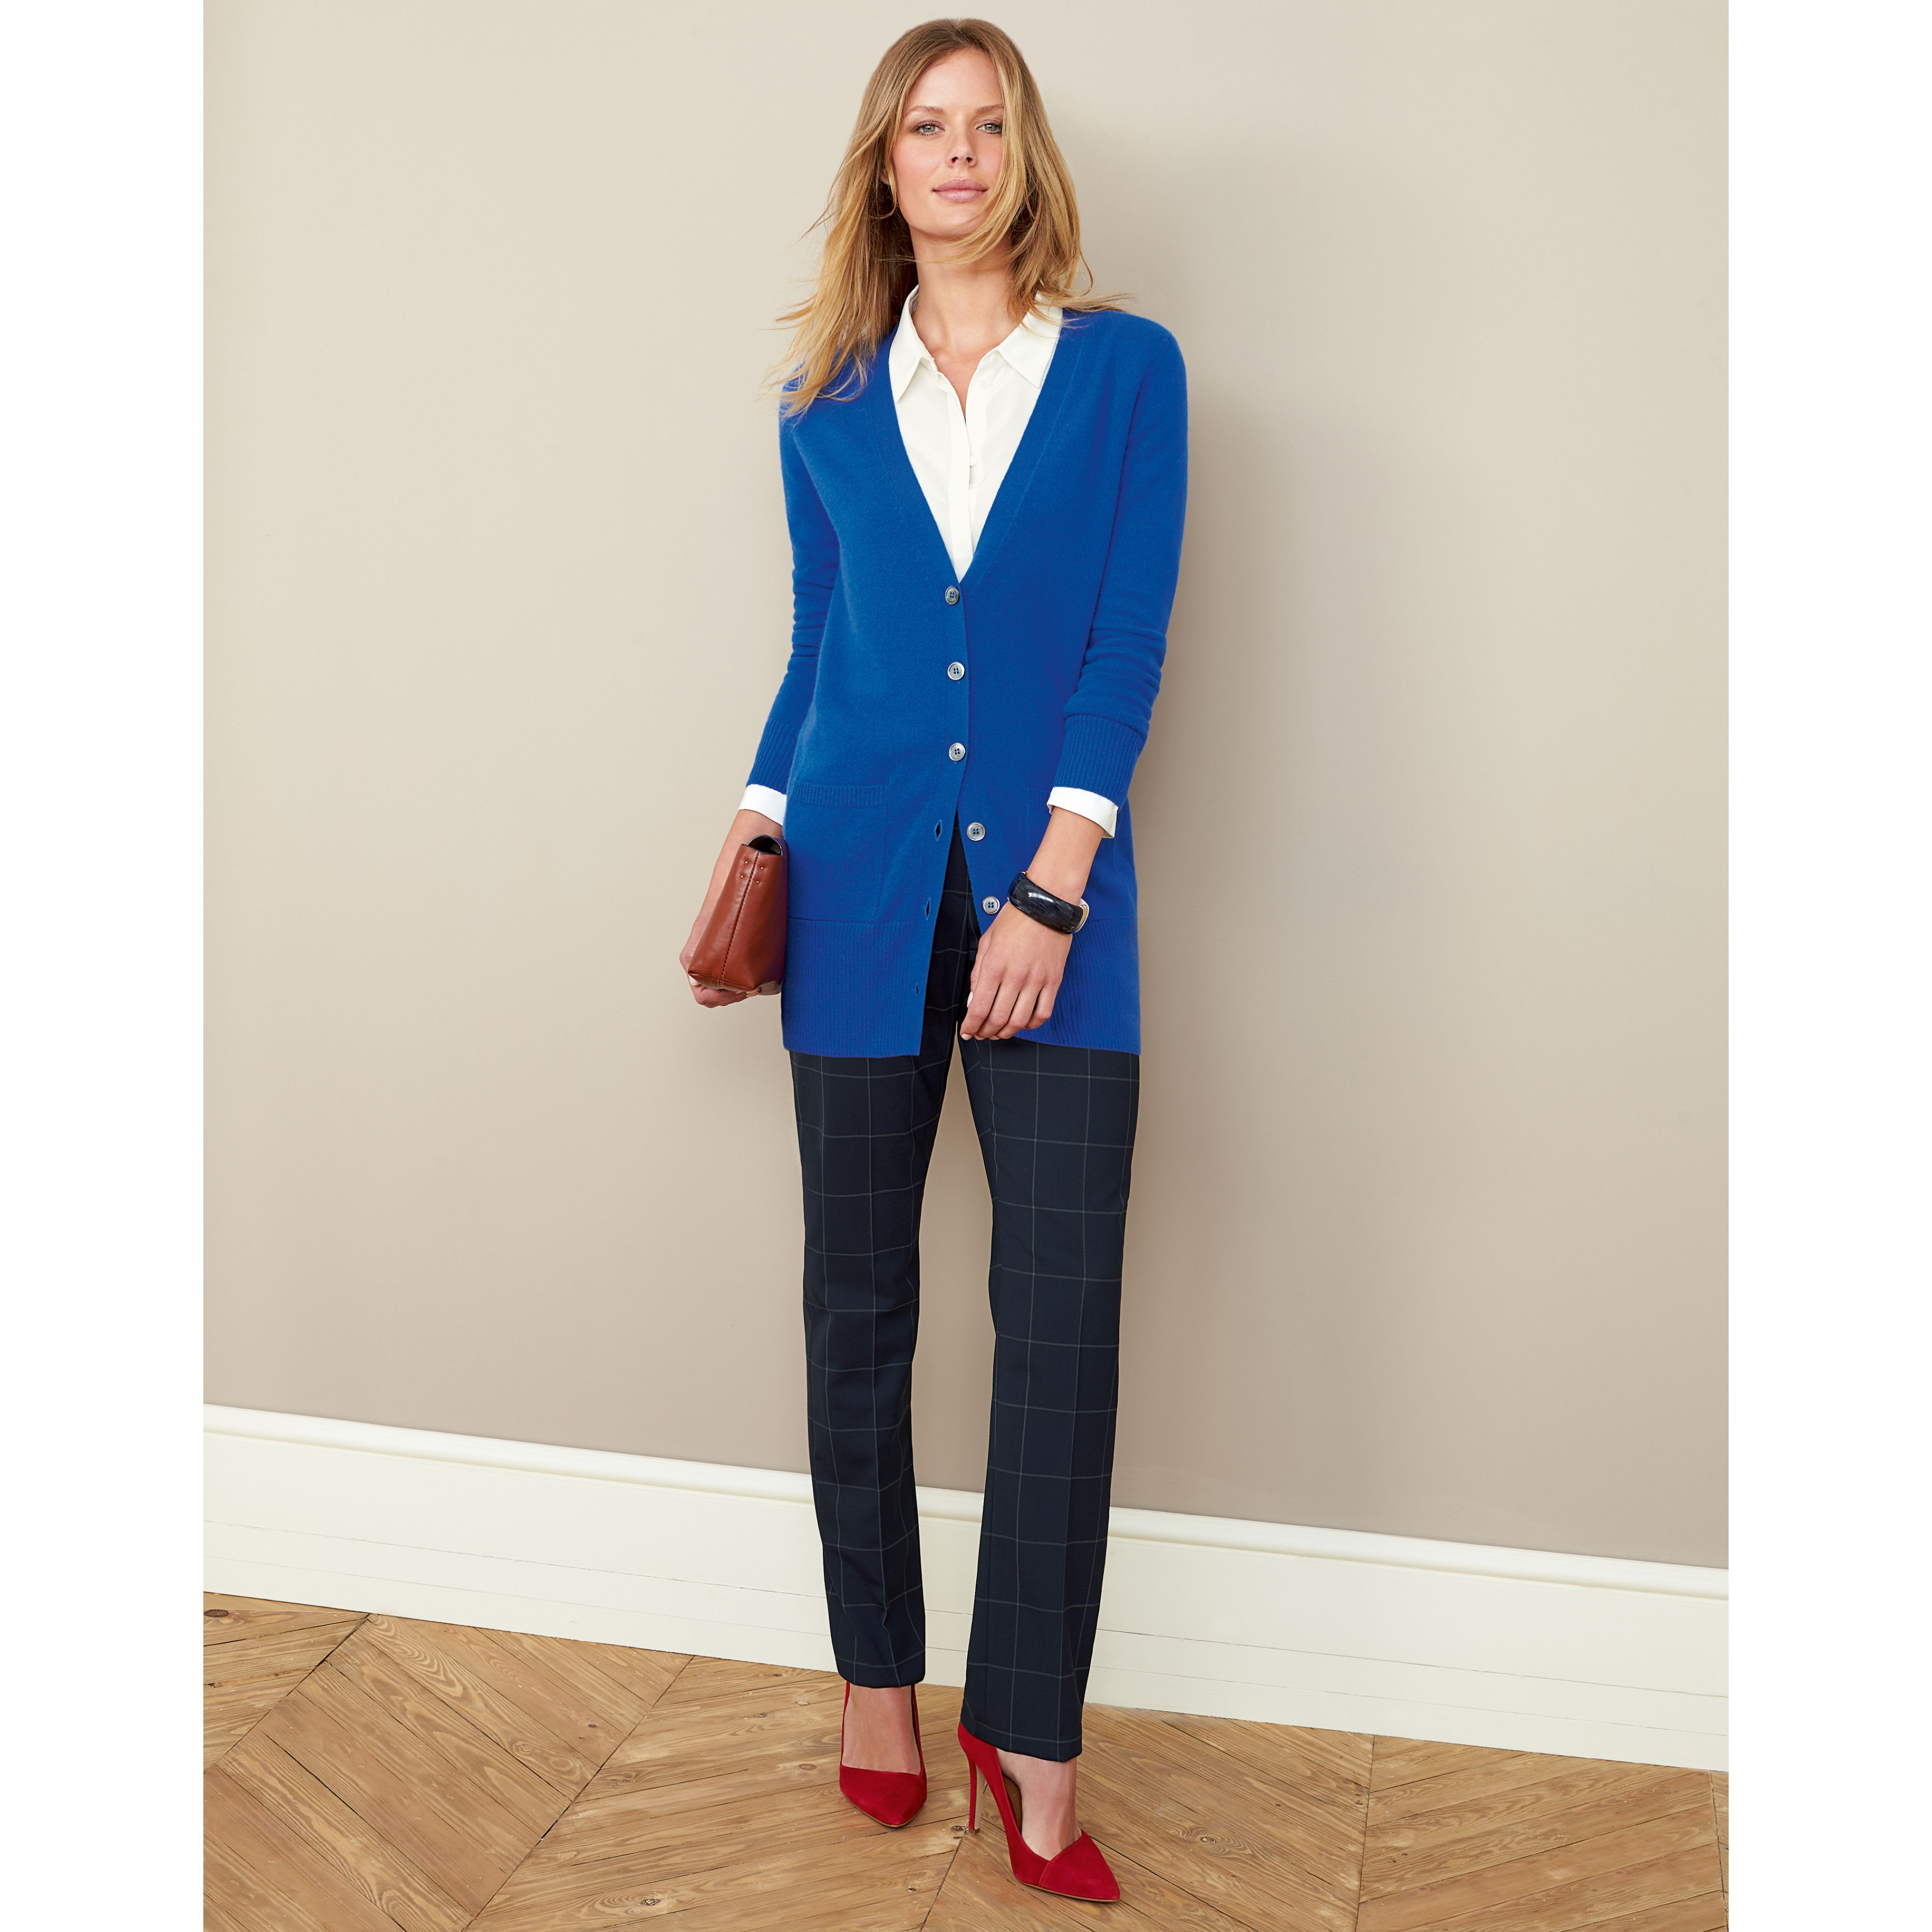 Royal Blue cardigan, white shirt, black window pane pants and red ...